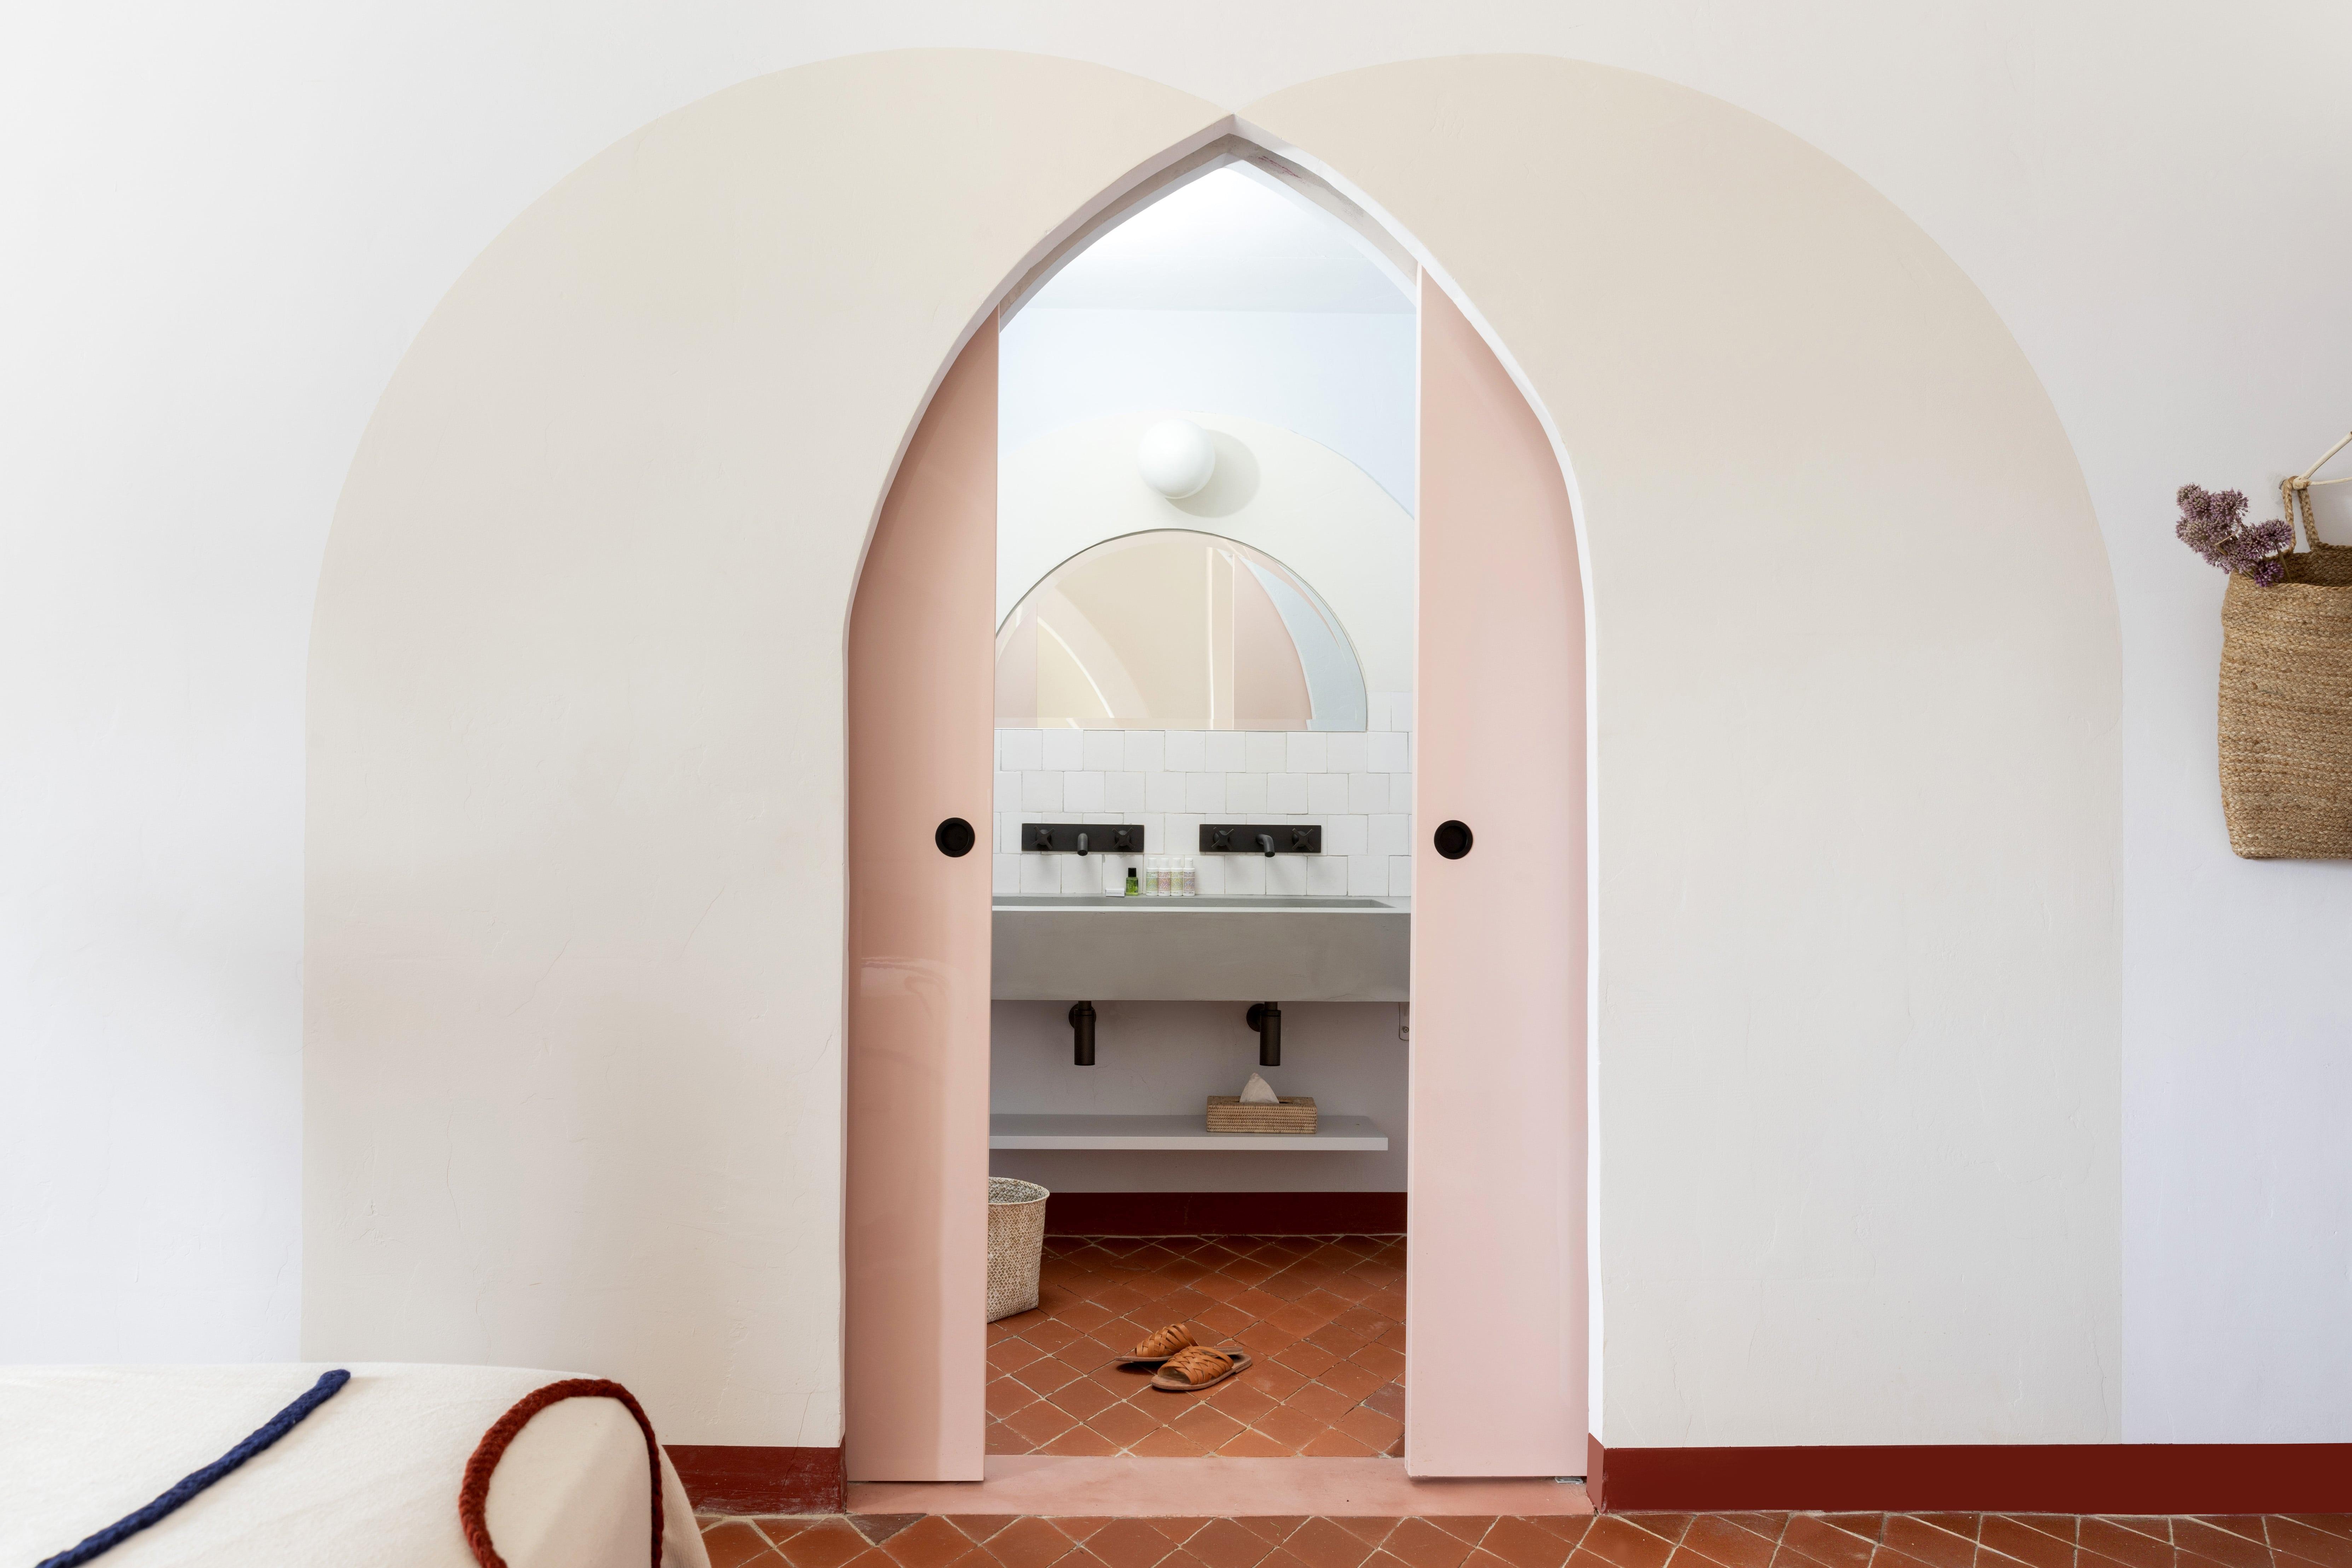 Habitación Son Bou 7 hotel experimental de Menorca